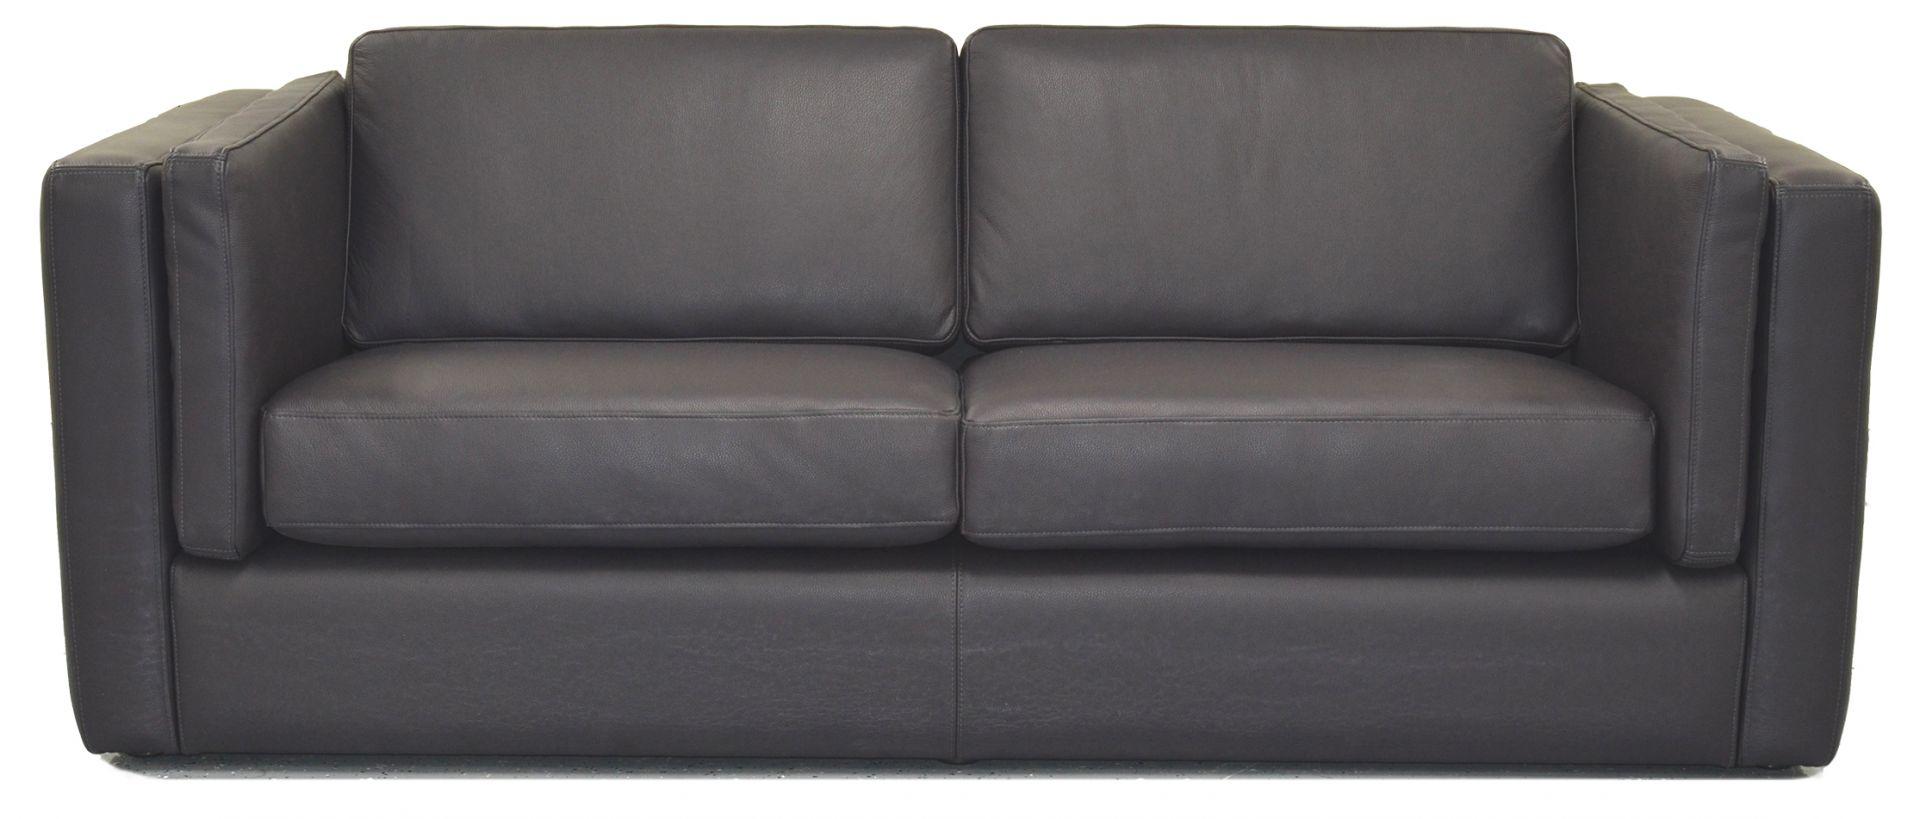 Soho Sofa ‹‹ The Leather Sofa Company